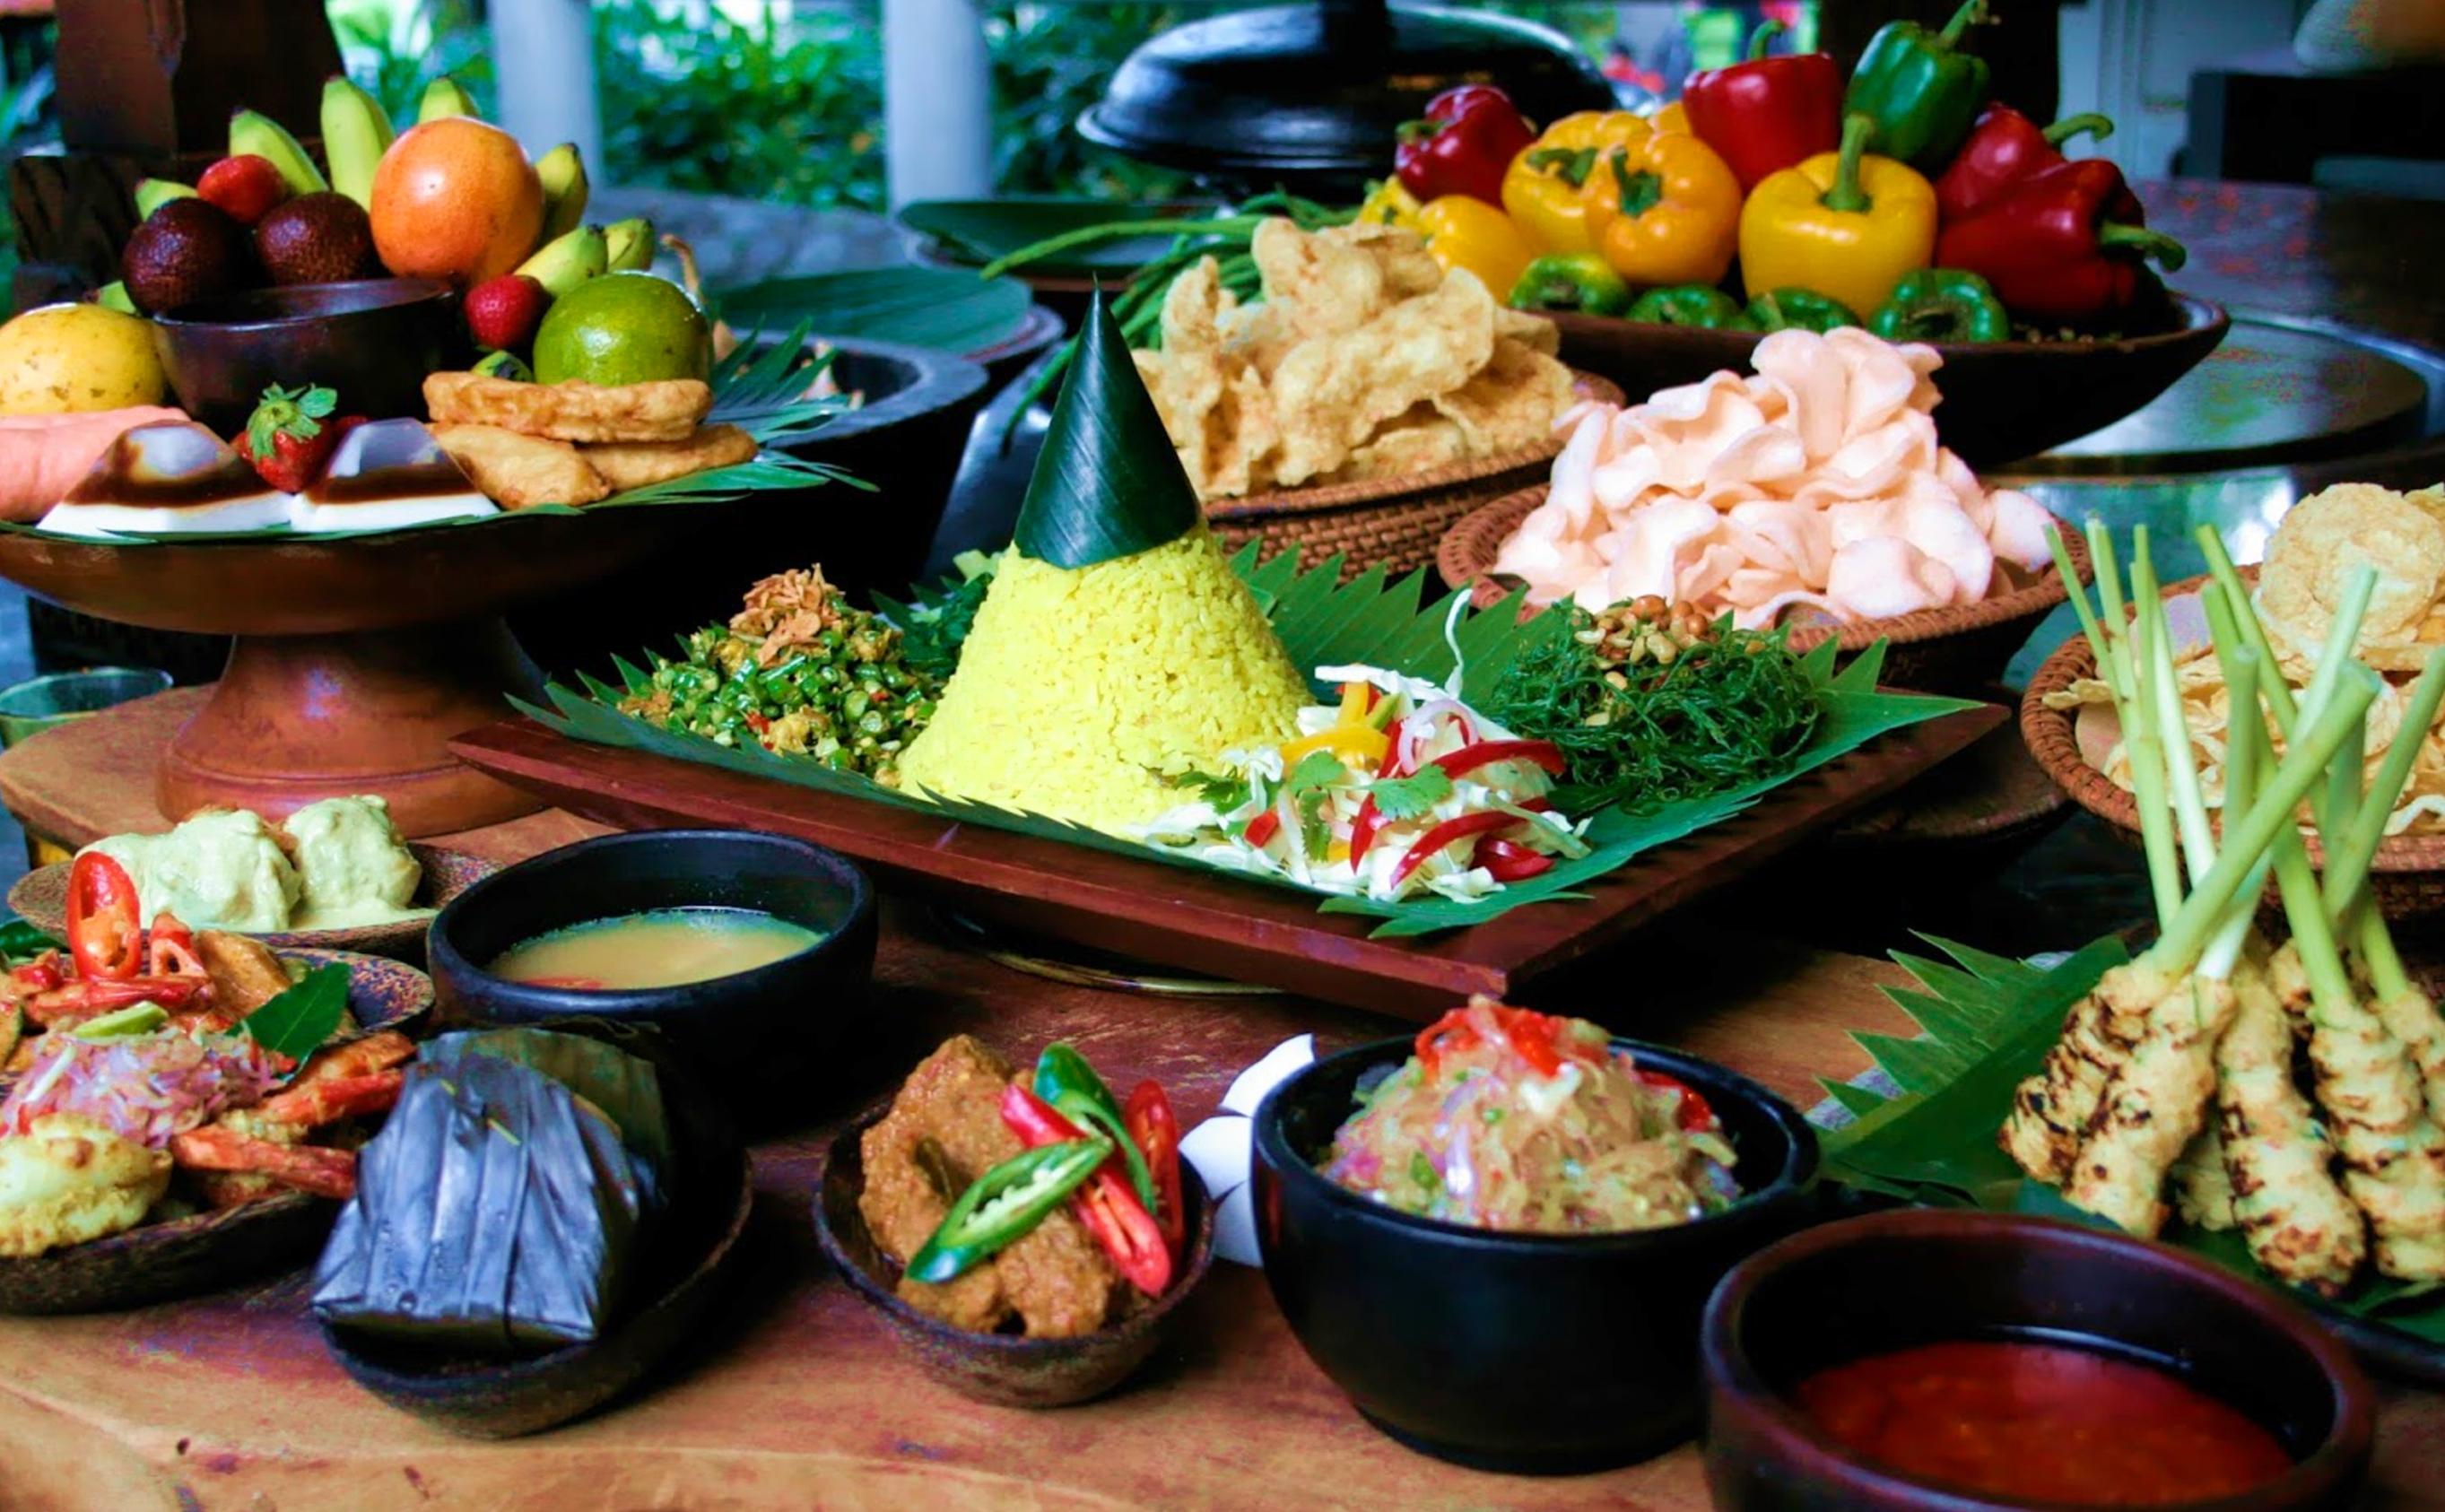 MaMa's Food Company: Healthy